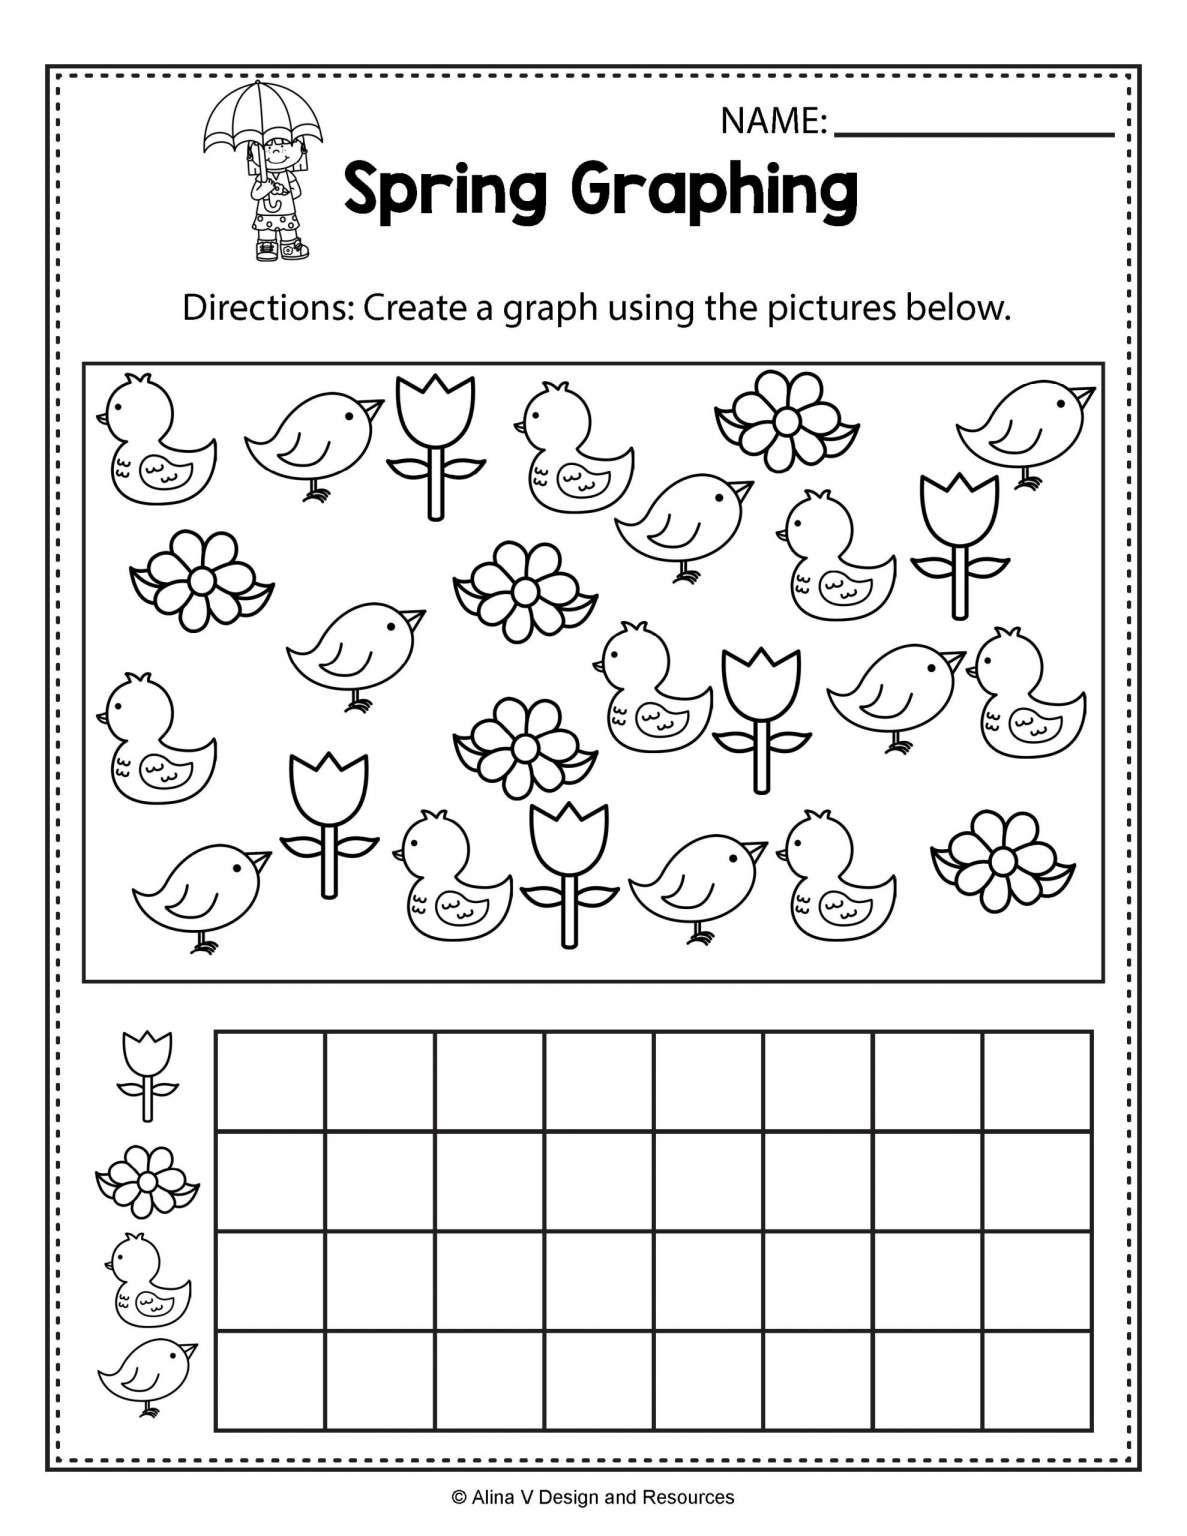 10+ Spring Worksheets For 3Rd Grade in 2020 Spring math